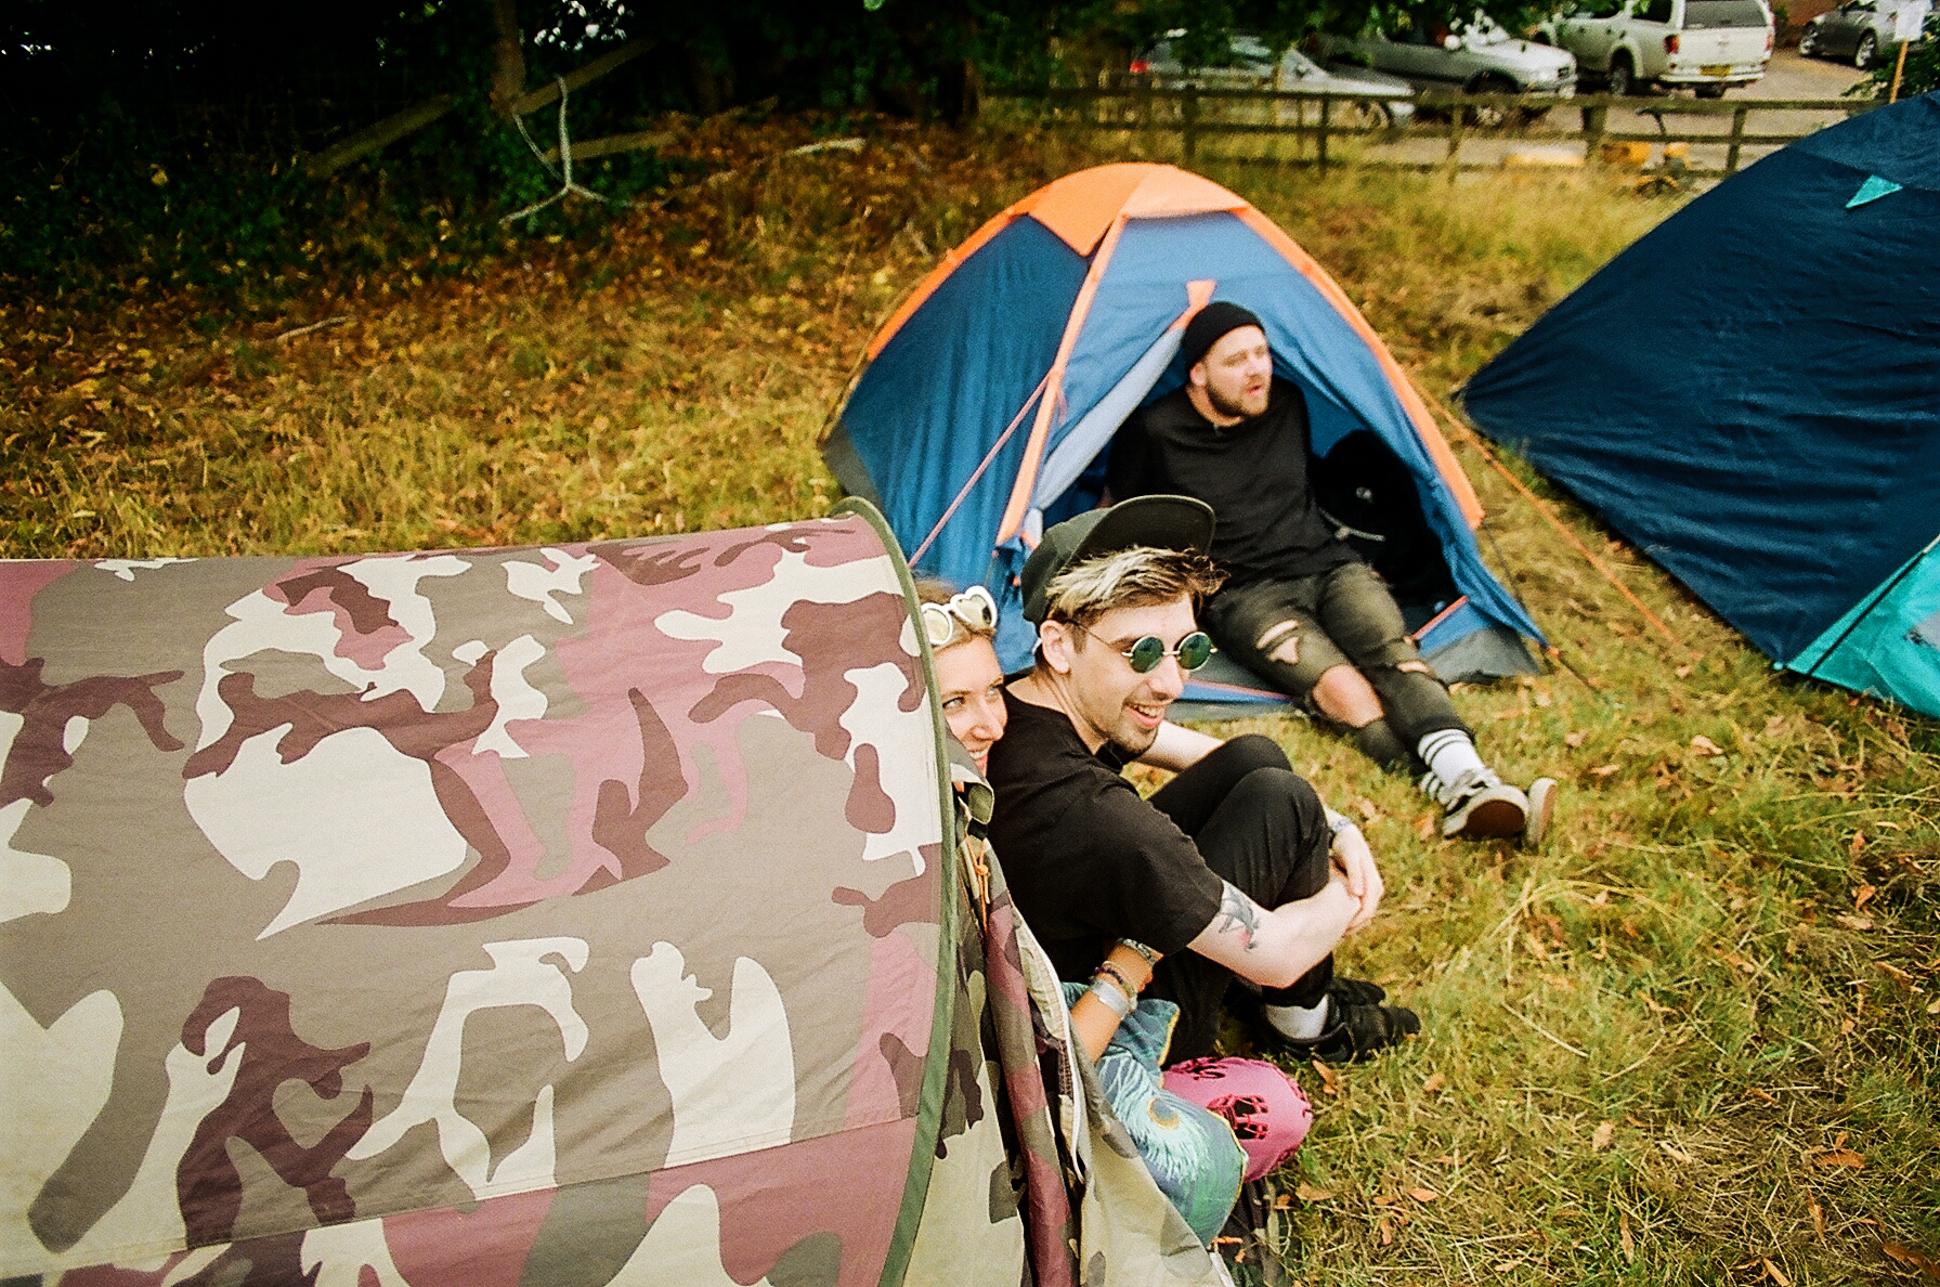 Joe and Chris - 110 Above Festival - August 2018 - 35mm - Ant Adams-1.jpg